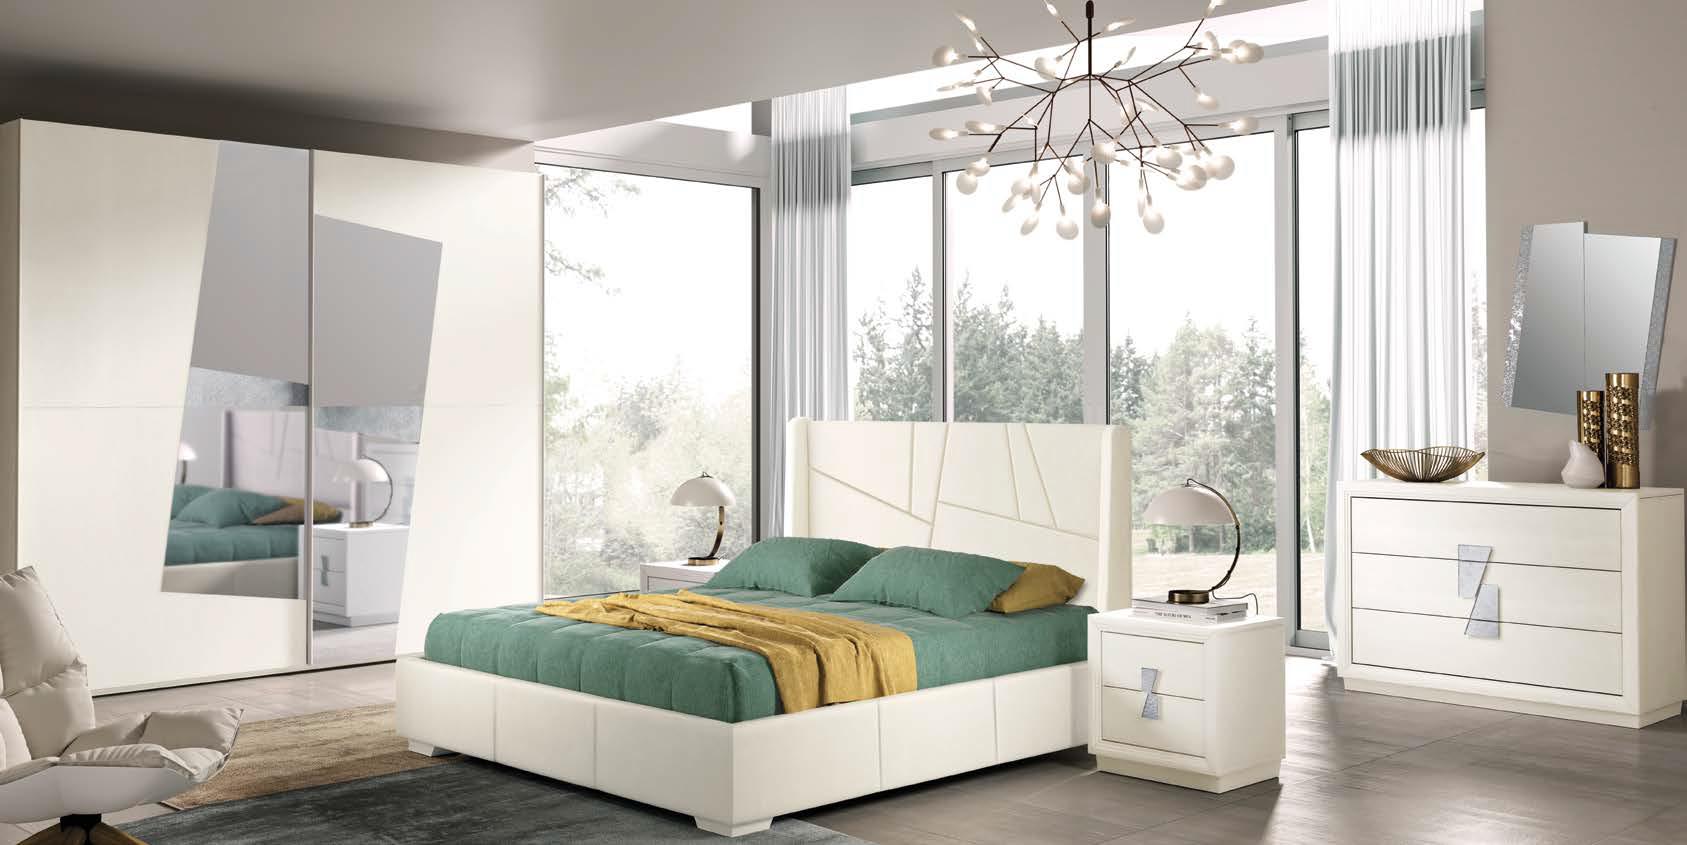 QUALITY SLEEPING NEEDS QUALITY BEDS